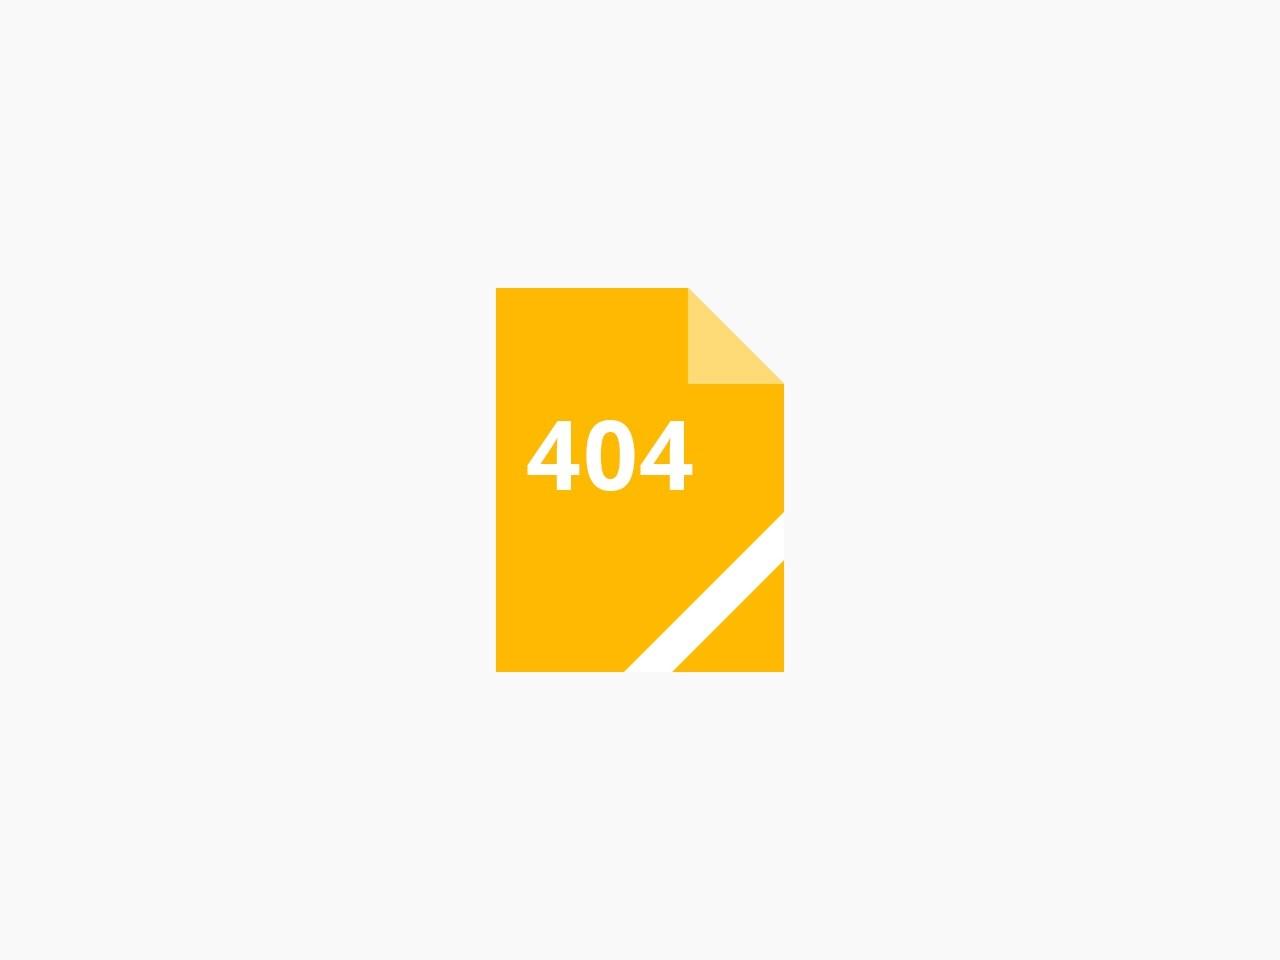 Developer behind 'SeaNav US' says app was rejected for …